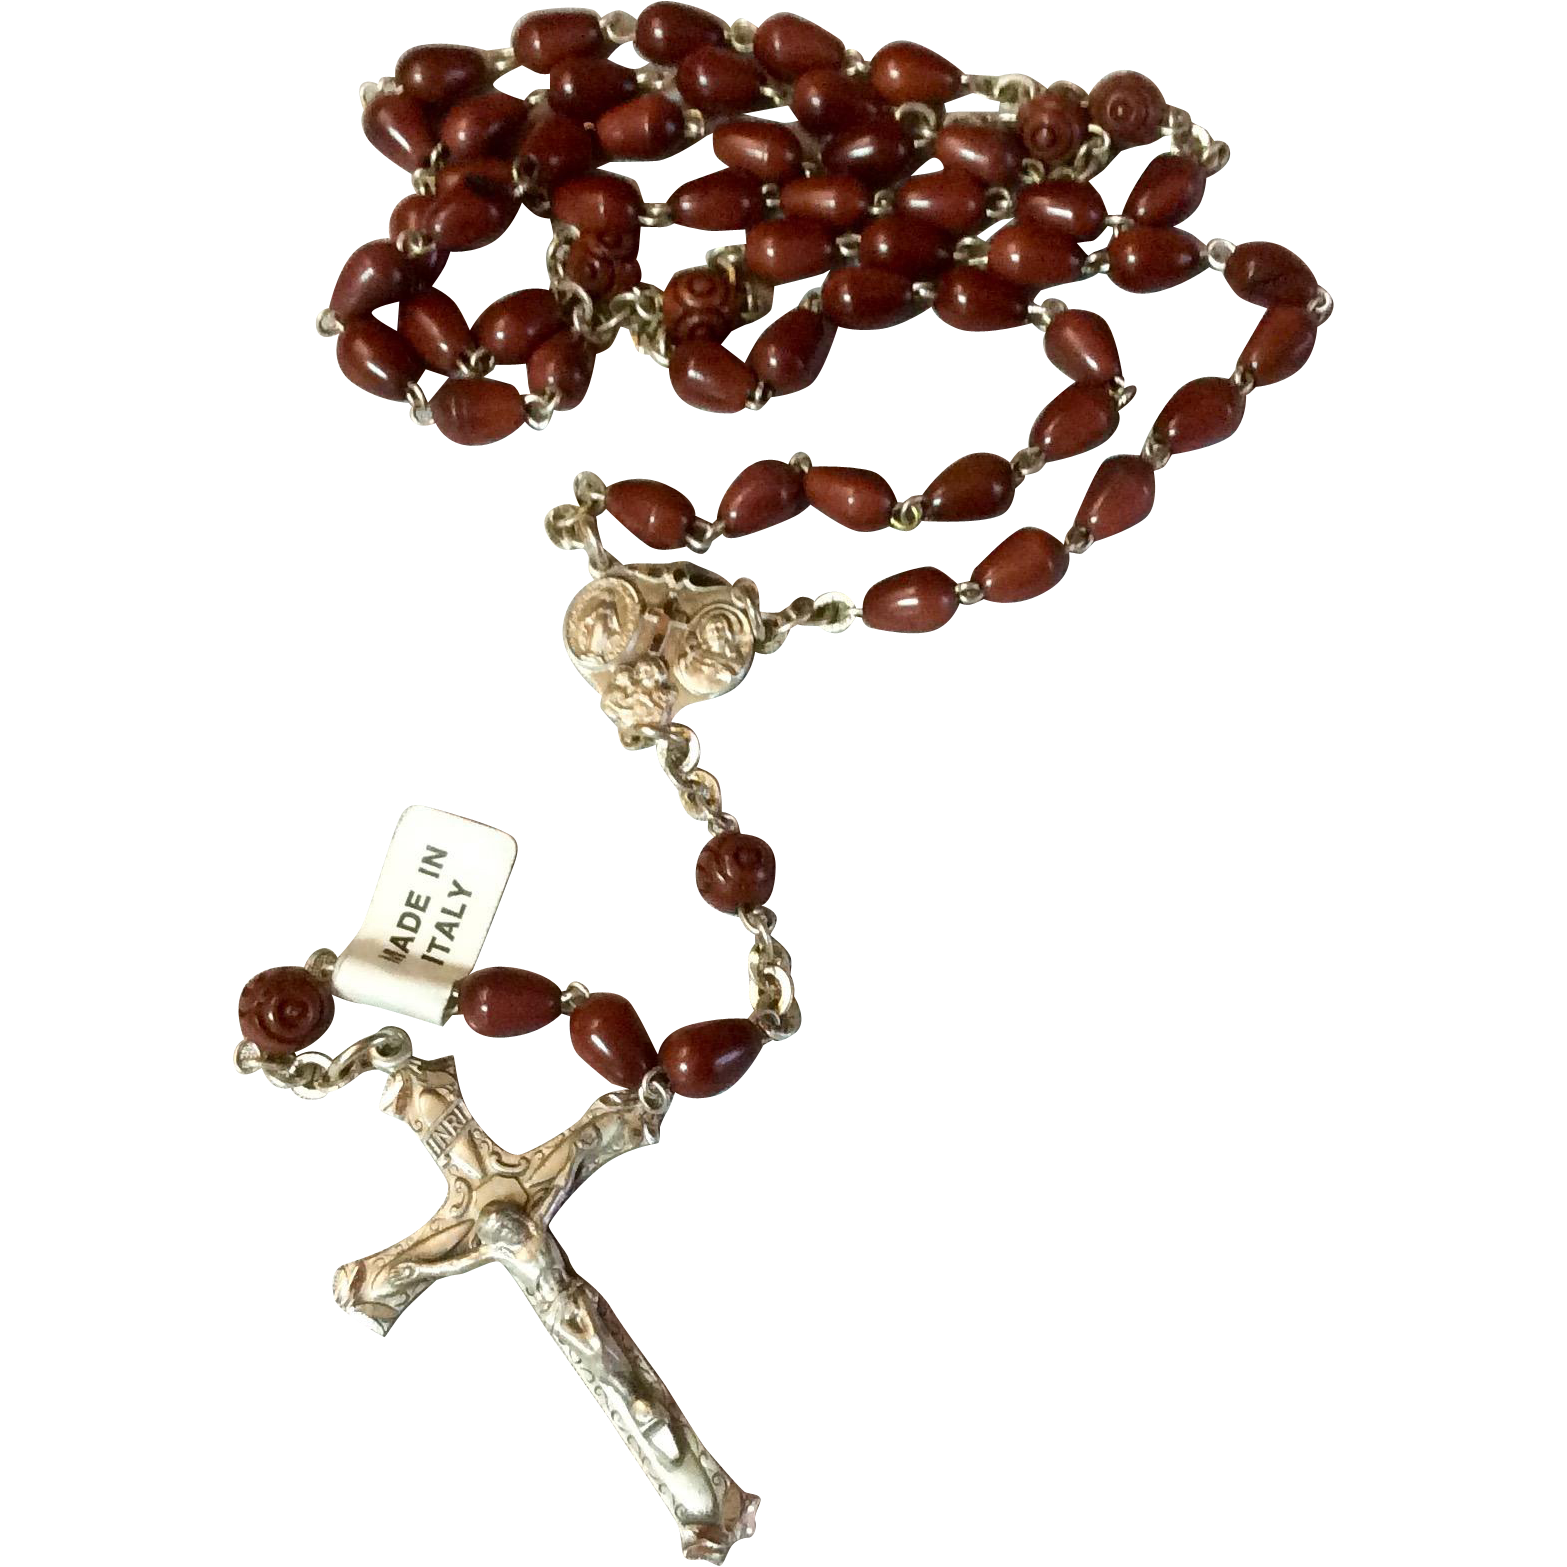 Vintage Sterling Silver Cocoa Bead Italian Catholic Rosary